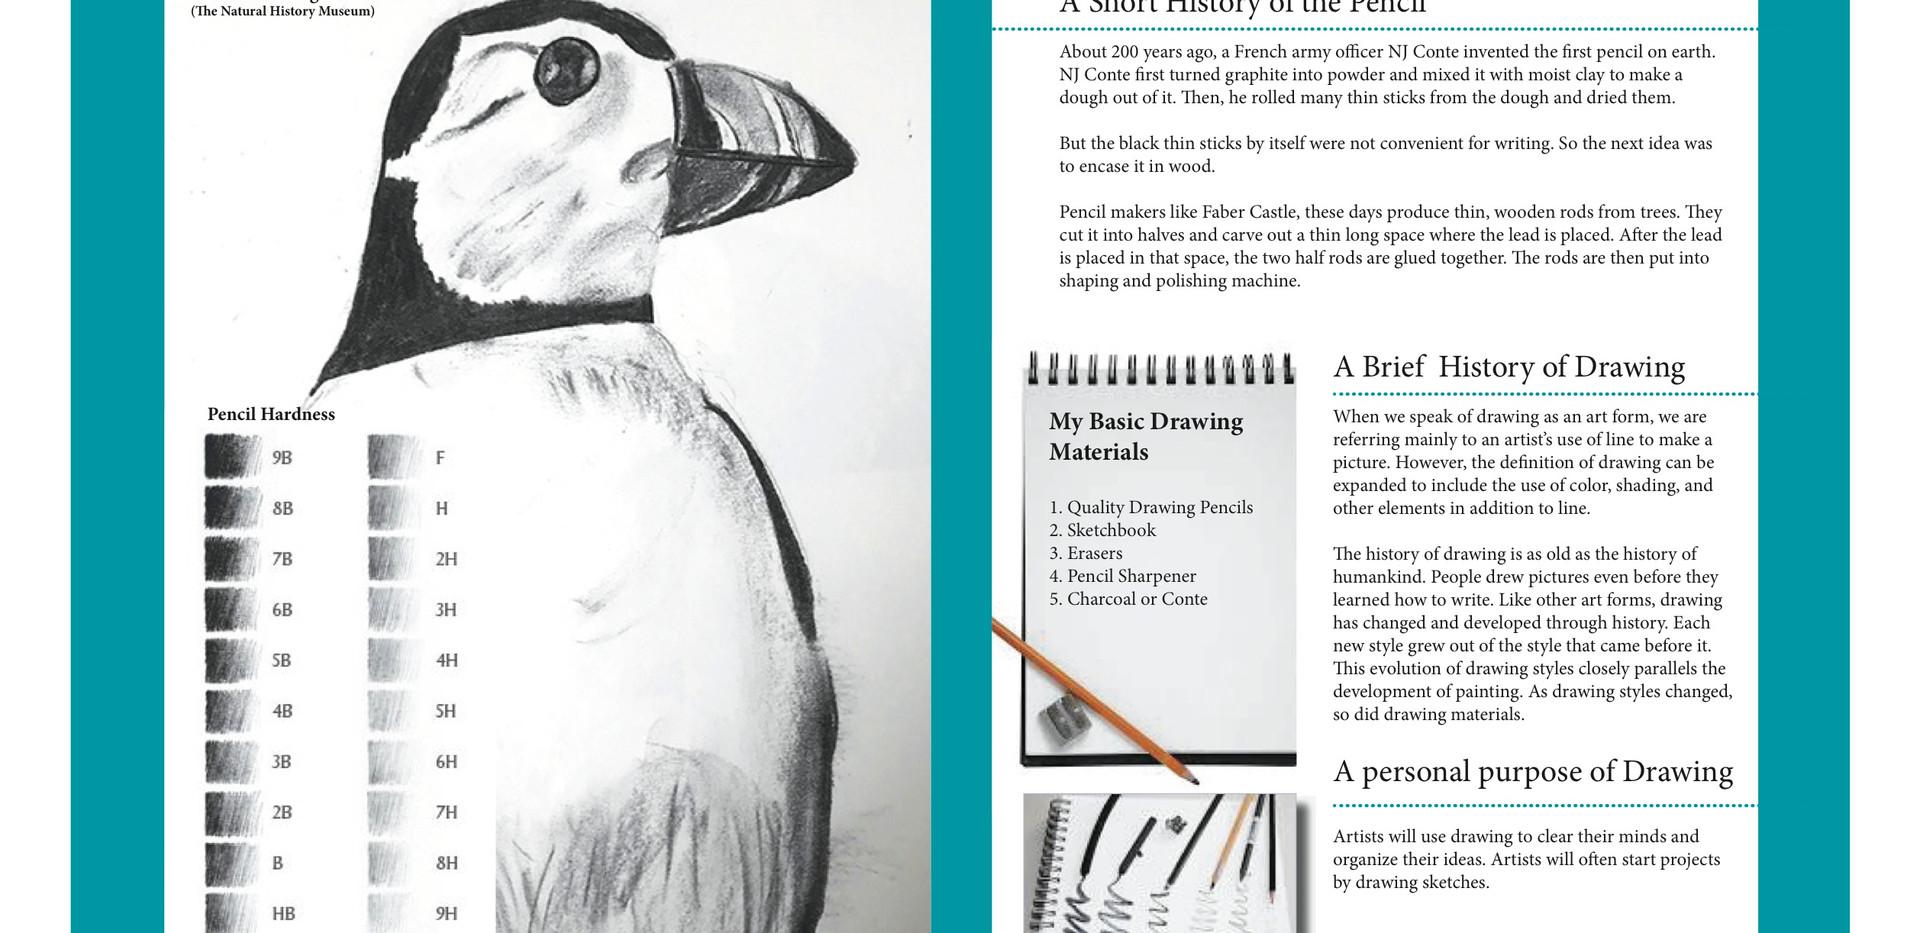 DIGITAL_NOTEBOOK_ART_ELEMENTS copy.jpg